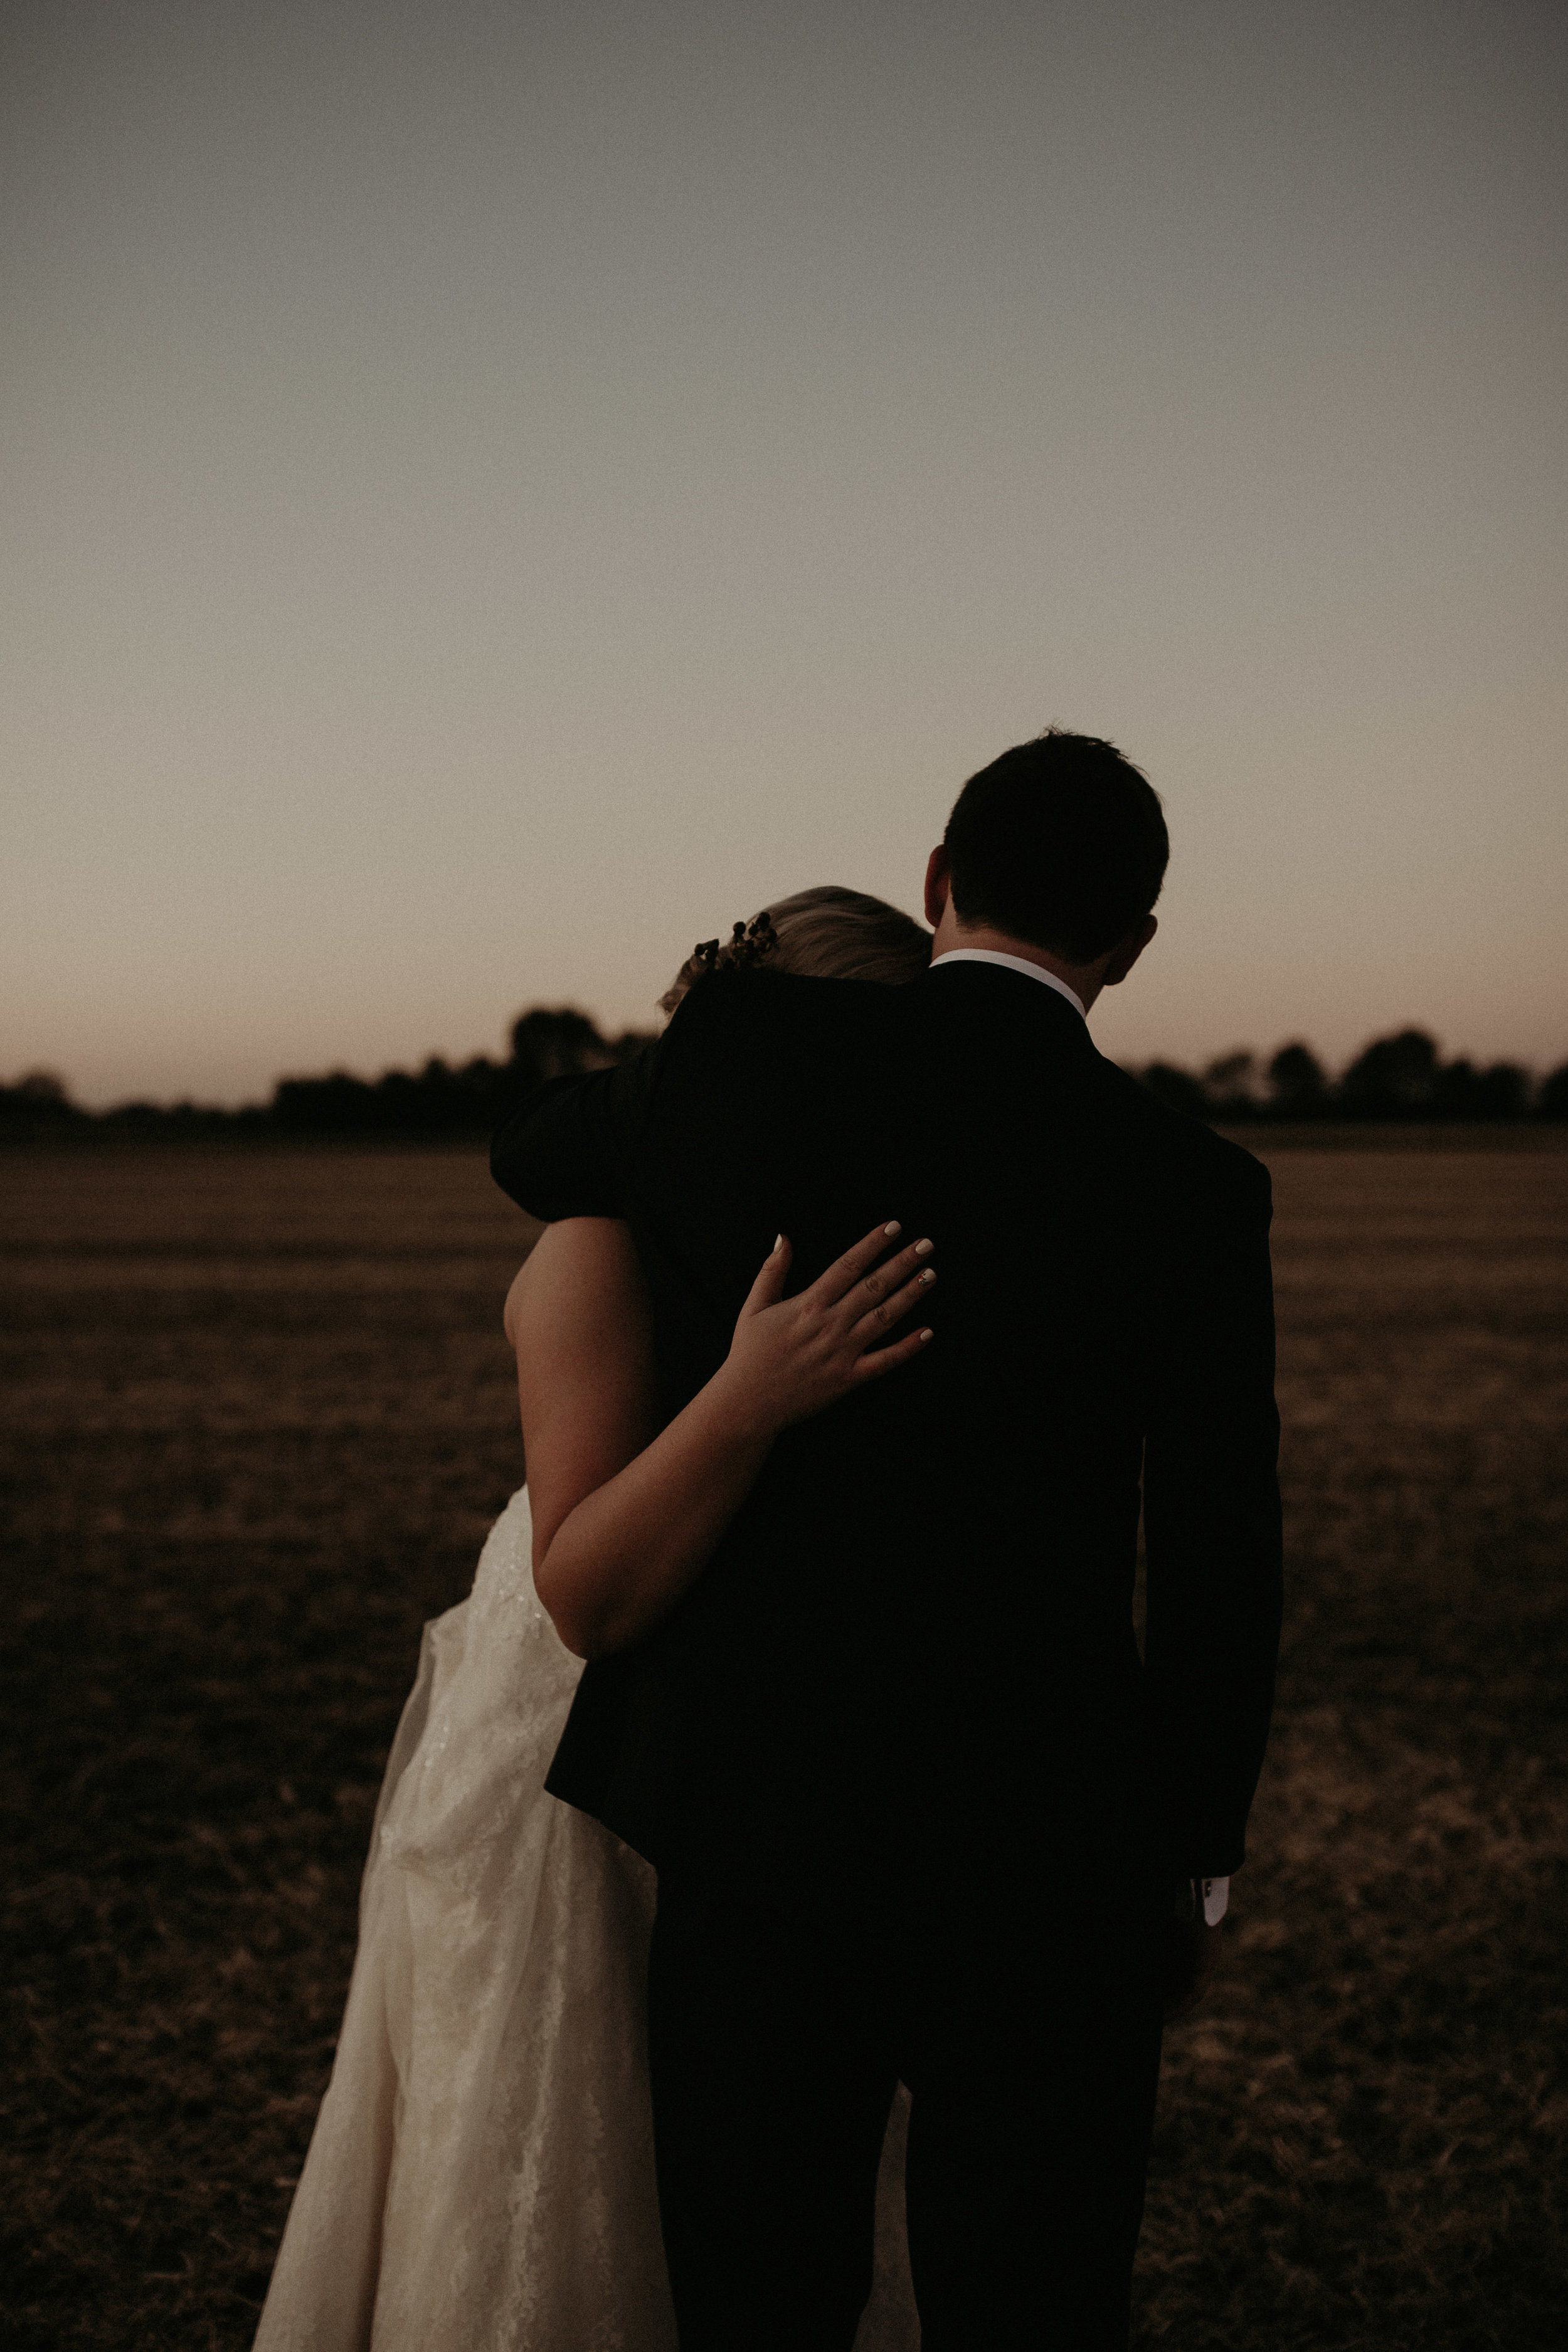 Sarah_Jason_Dayton_Ohio_Wedding-EDIT-525.JPG